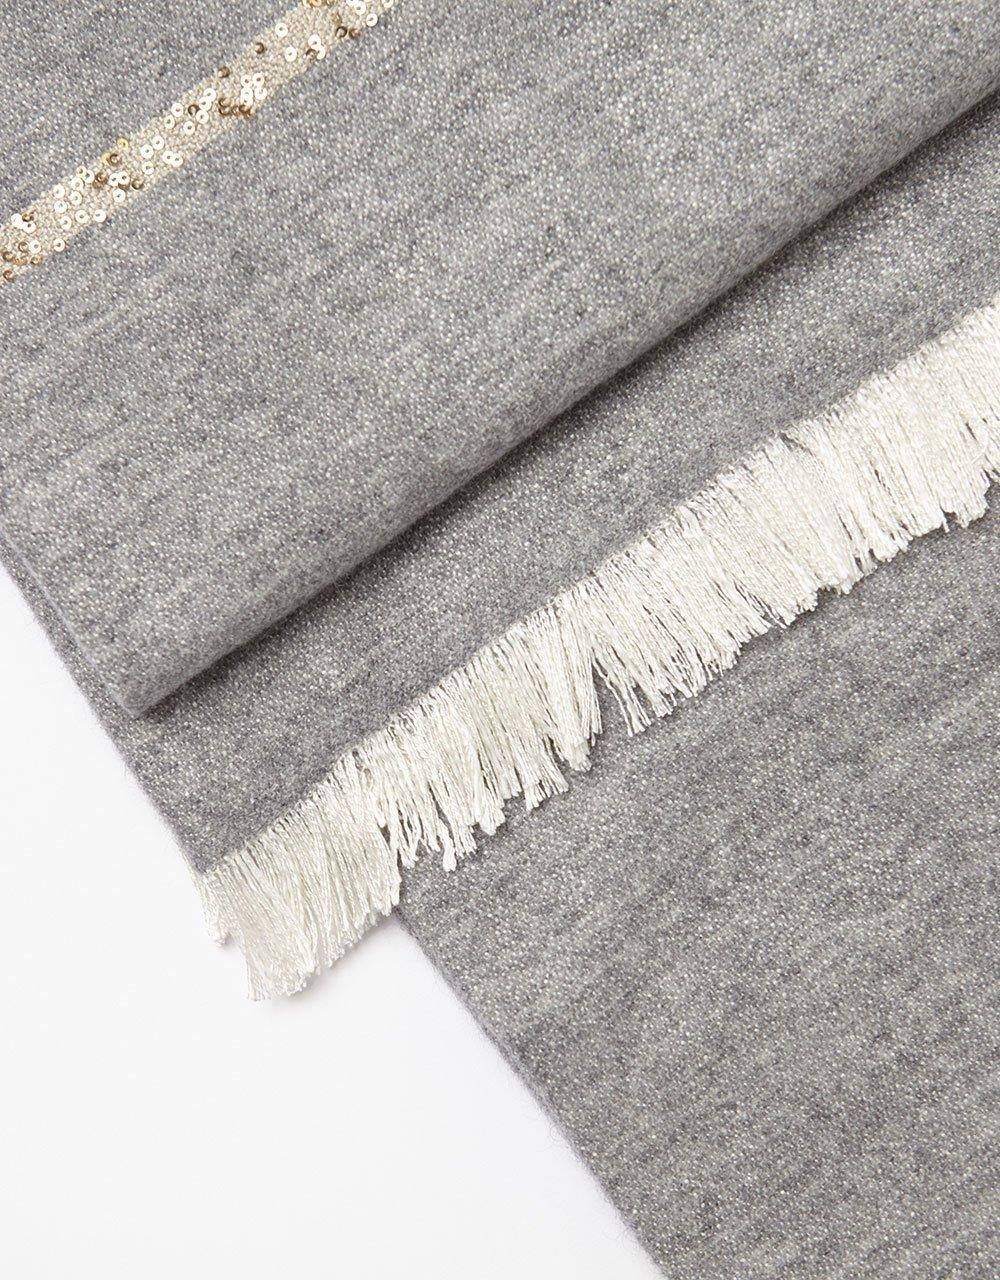 shawl04i